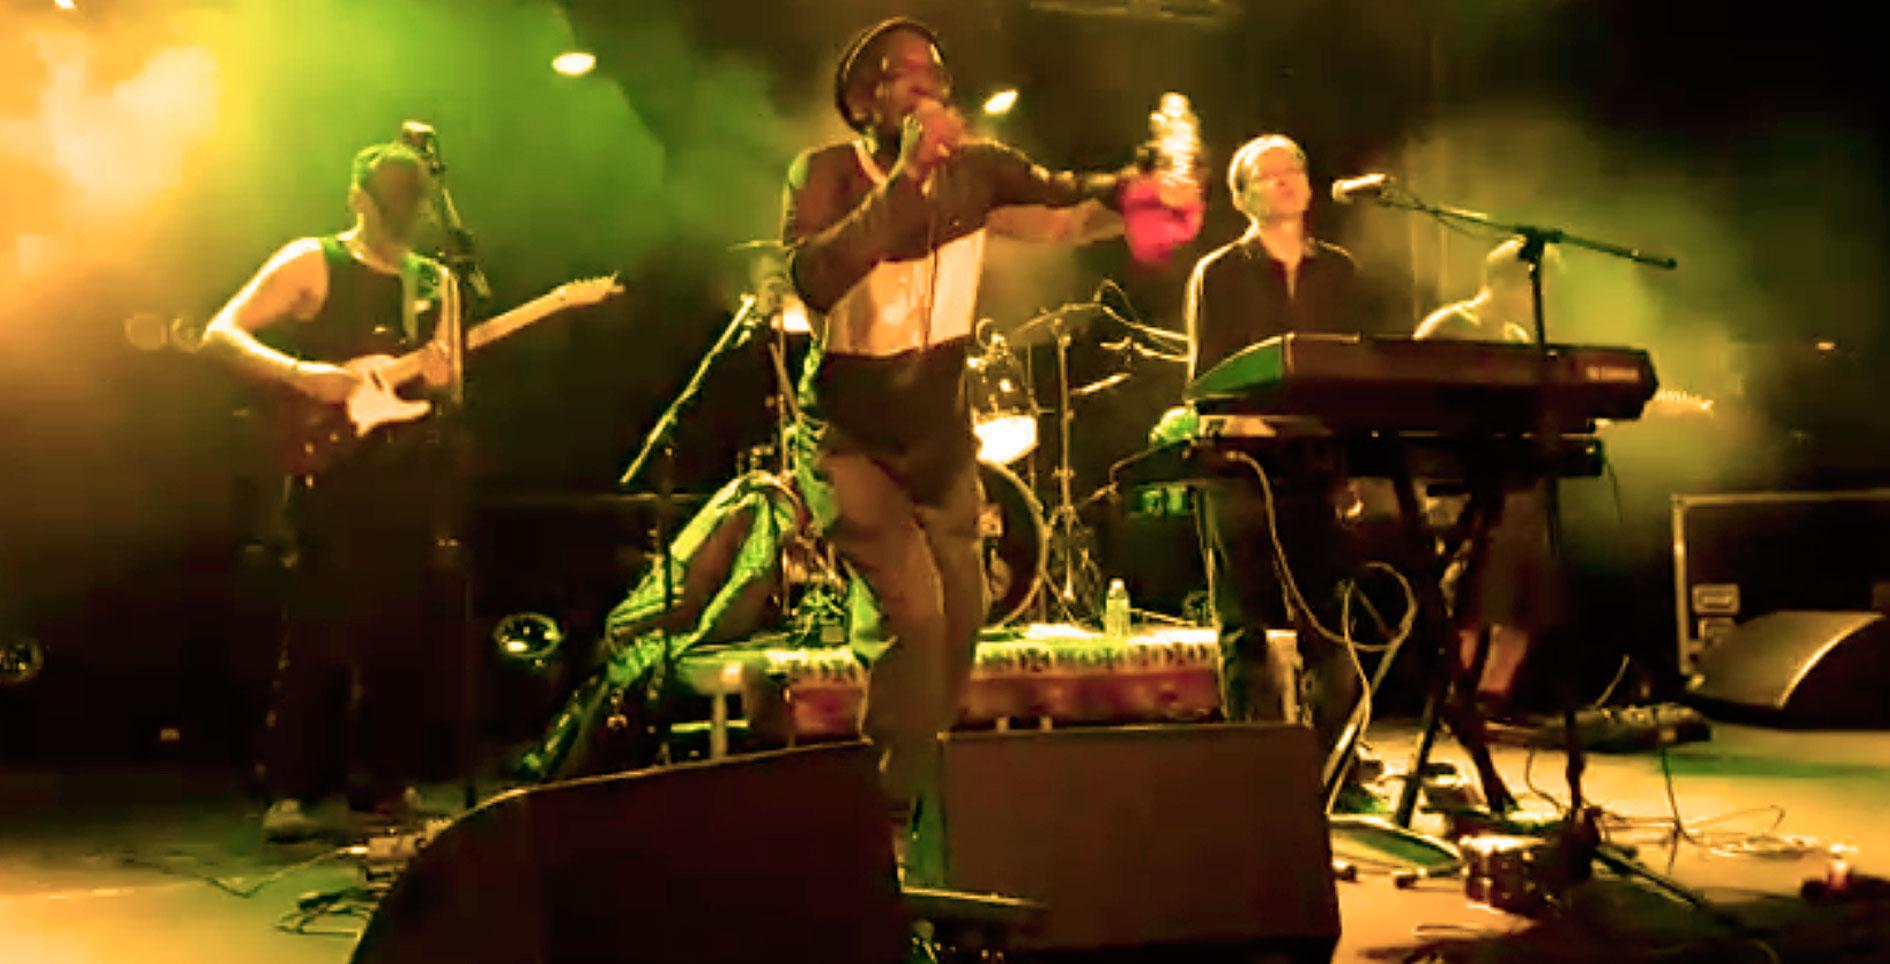 Roots Connection live La Biscuiterie - 21 juin CHATEAU-THIERRY